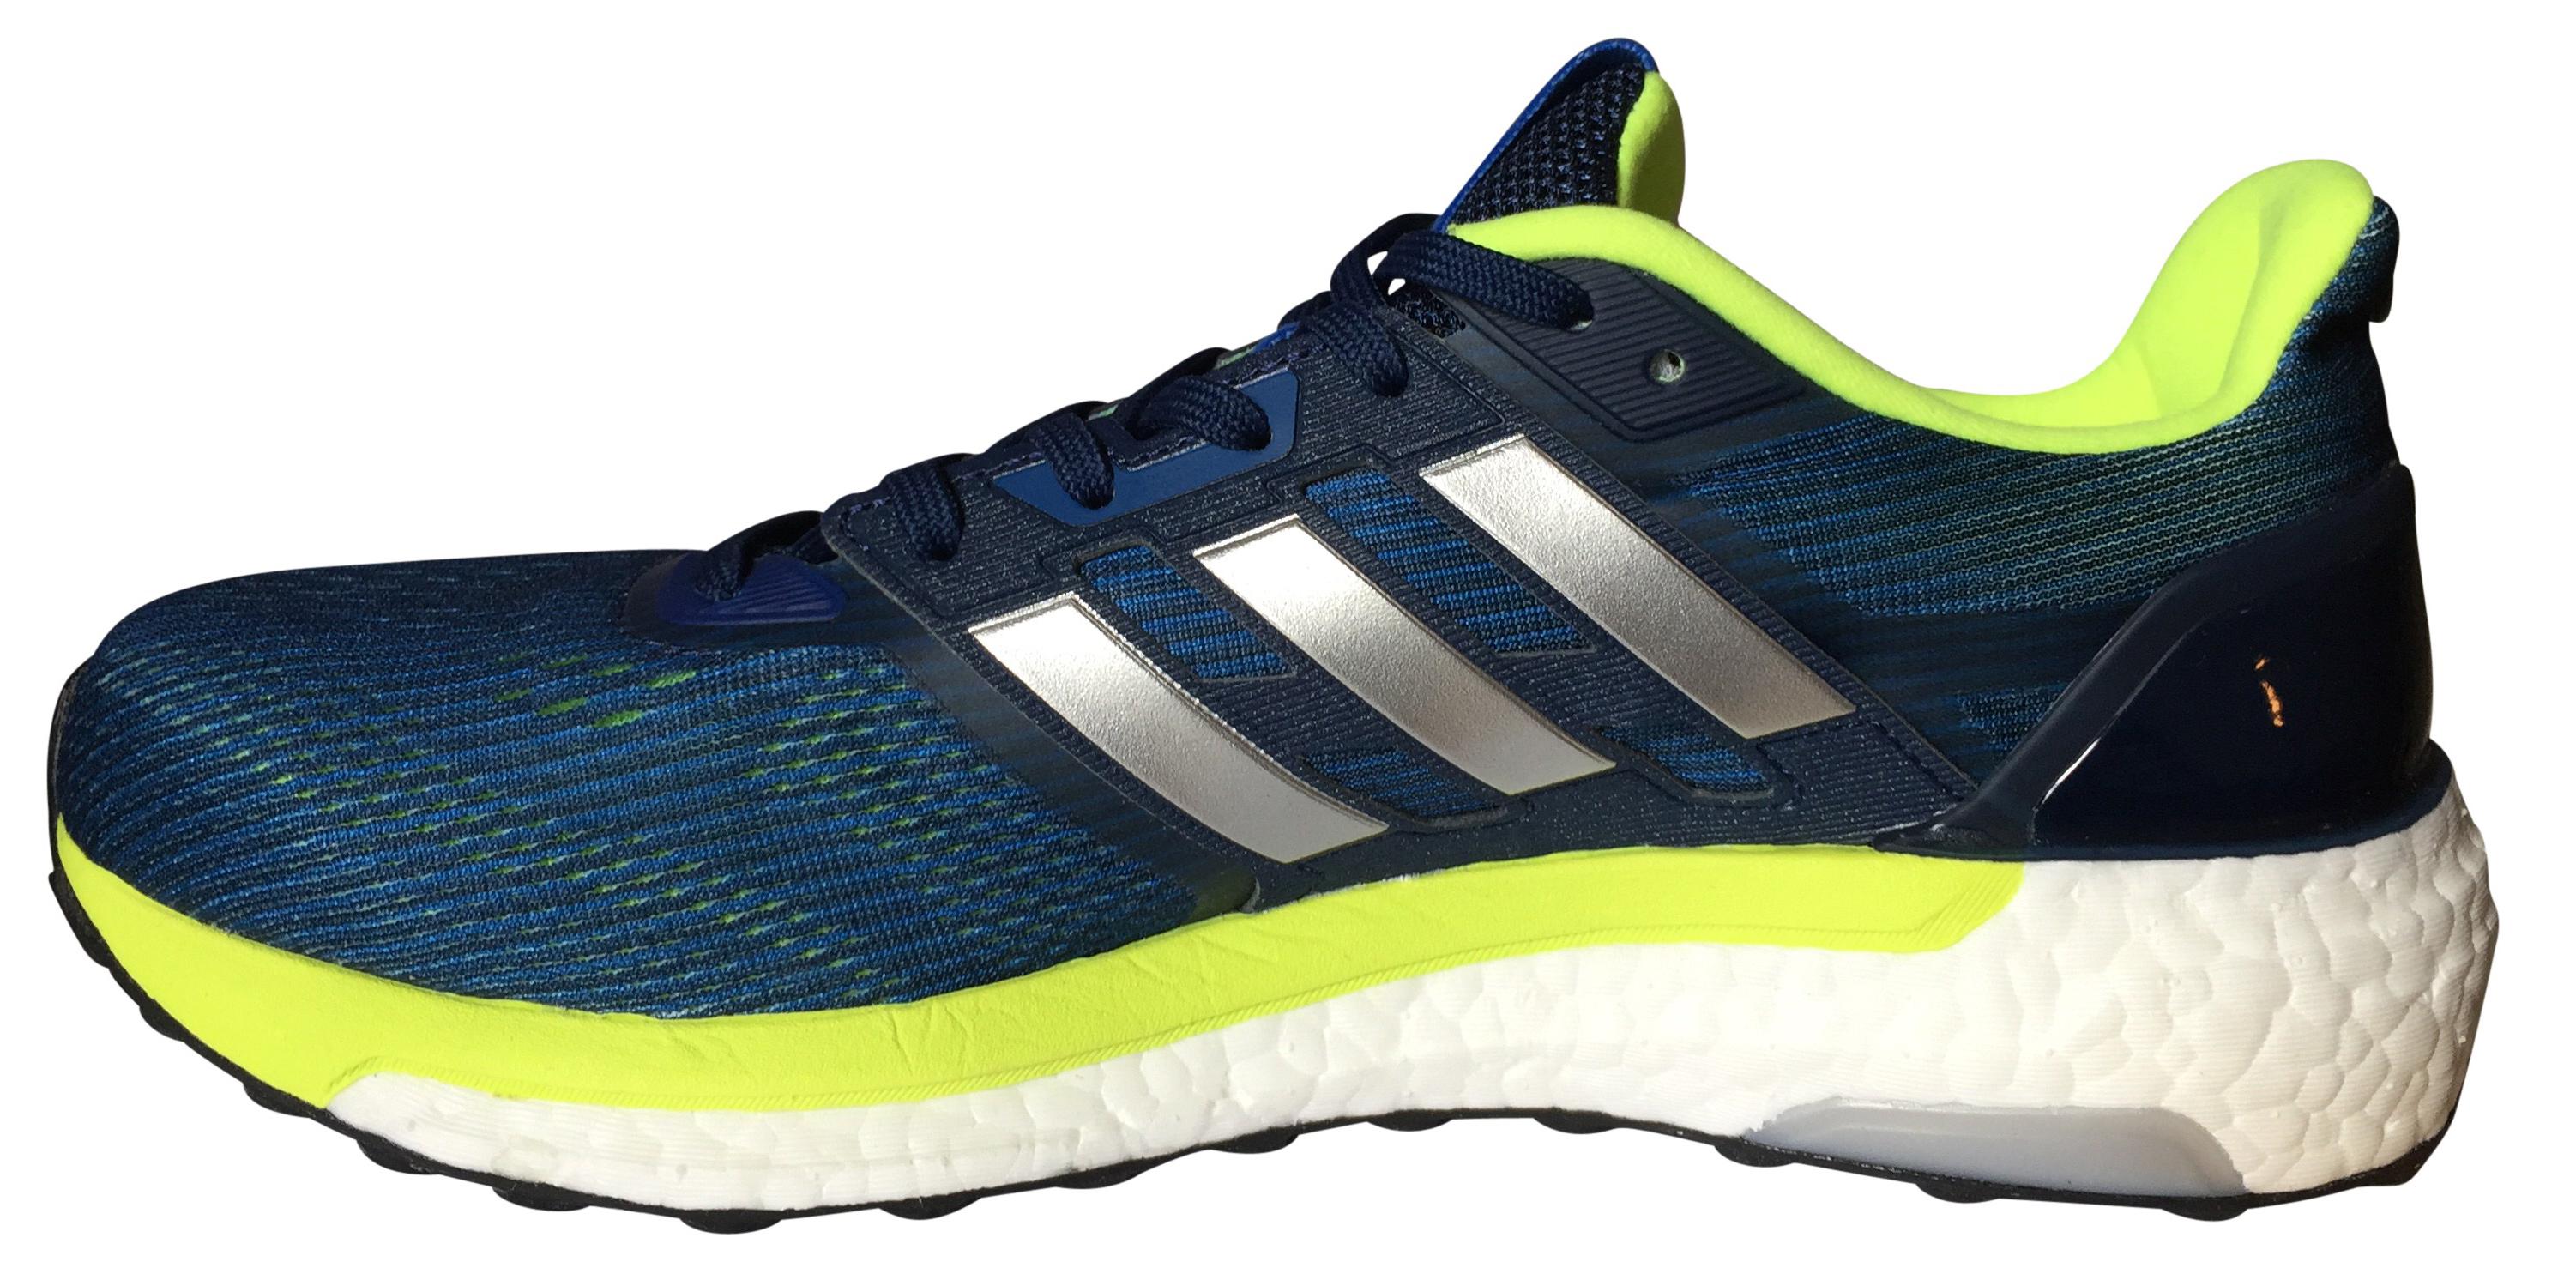 Running shoe review: Adidas Supernova Glide 9 | Craft brews